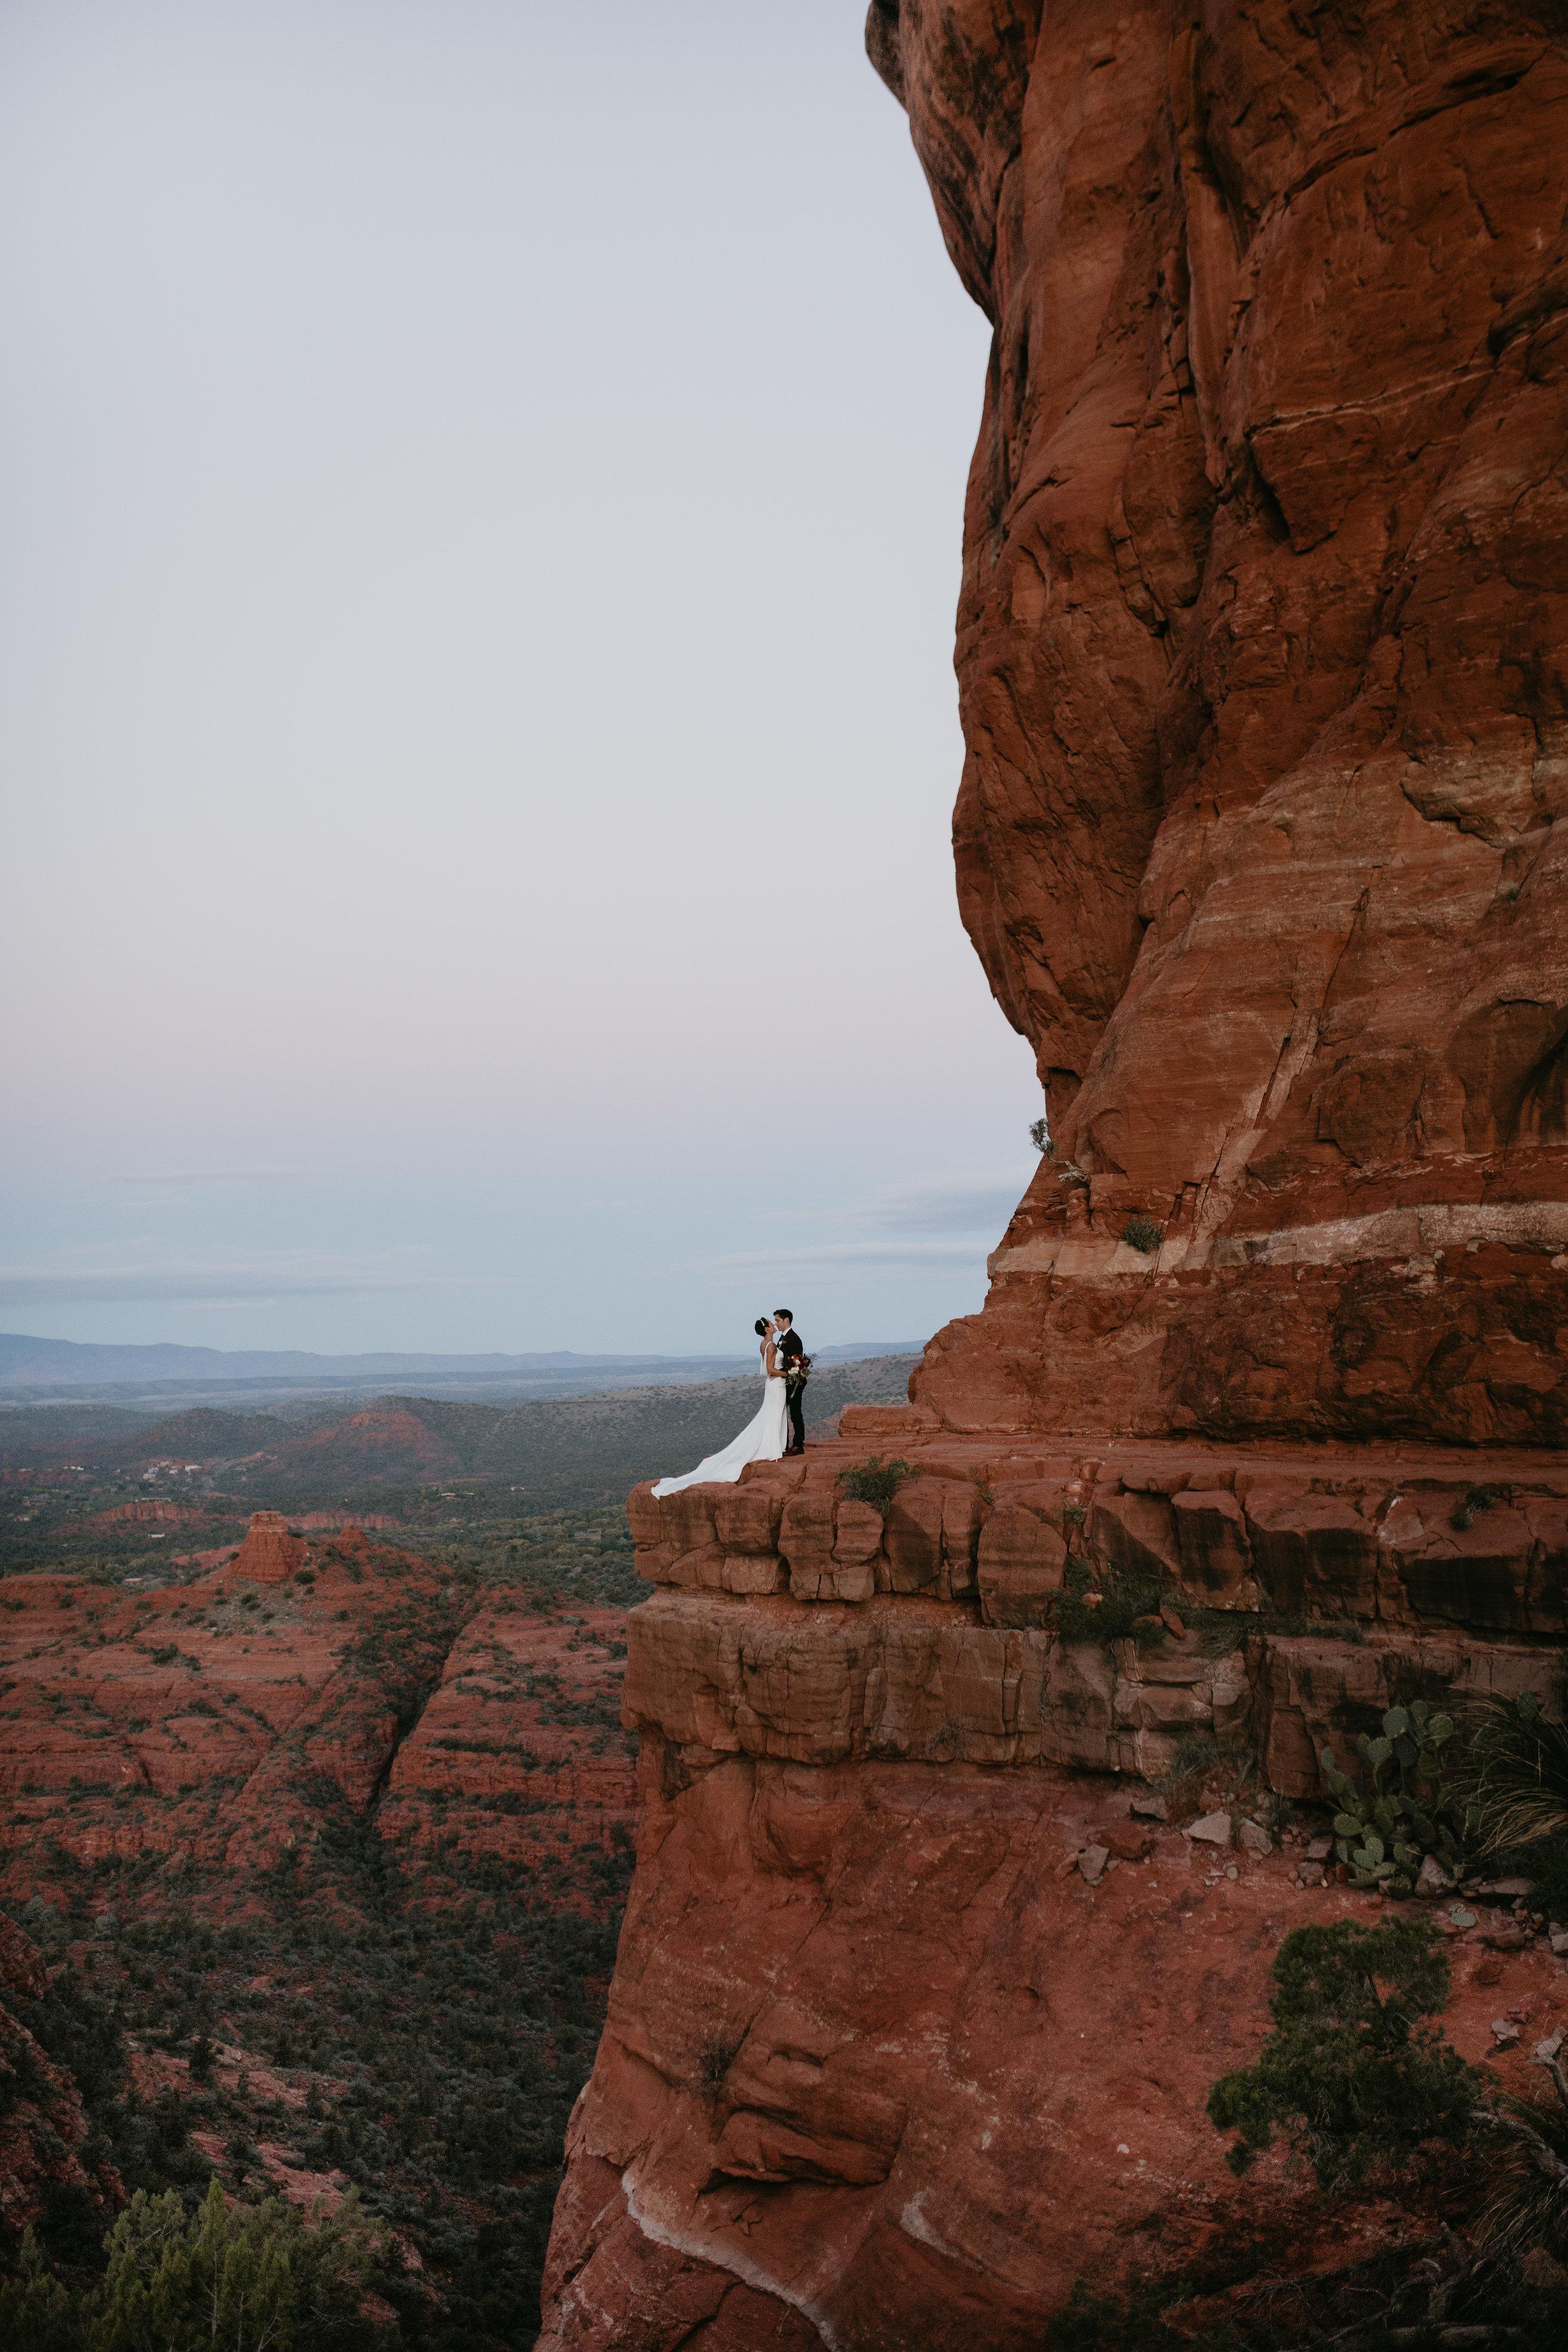 nicole-daacke-photography-sedona-arizona-destination-elopement-wedding-photographer-catherdral-rock-hiking-elopement-sedona-river-elopement-photos-desert-rock-wedding-photographer-laid-back-spontaneous-elopement-10.jpg